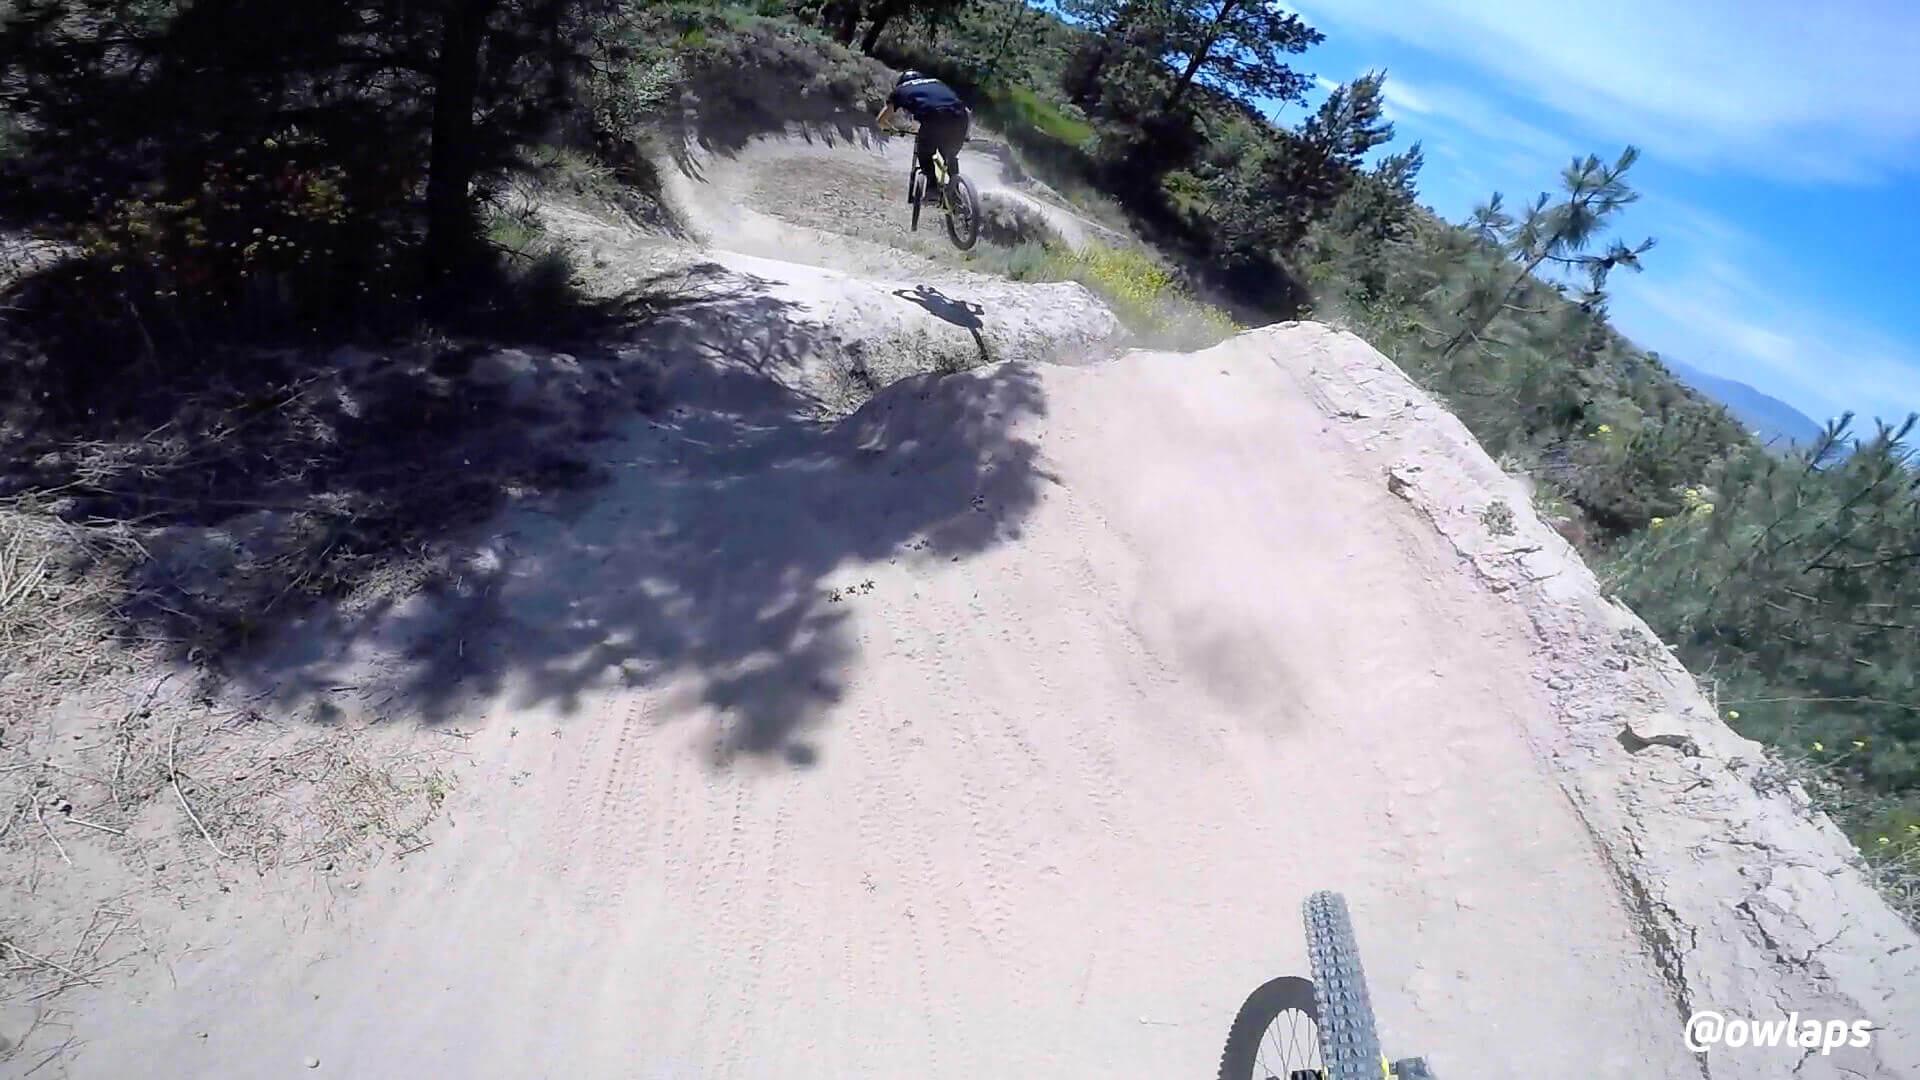 wrangler-kamloops-bike-ranch-canada-owlaps-HD-5